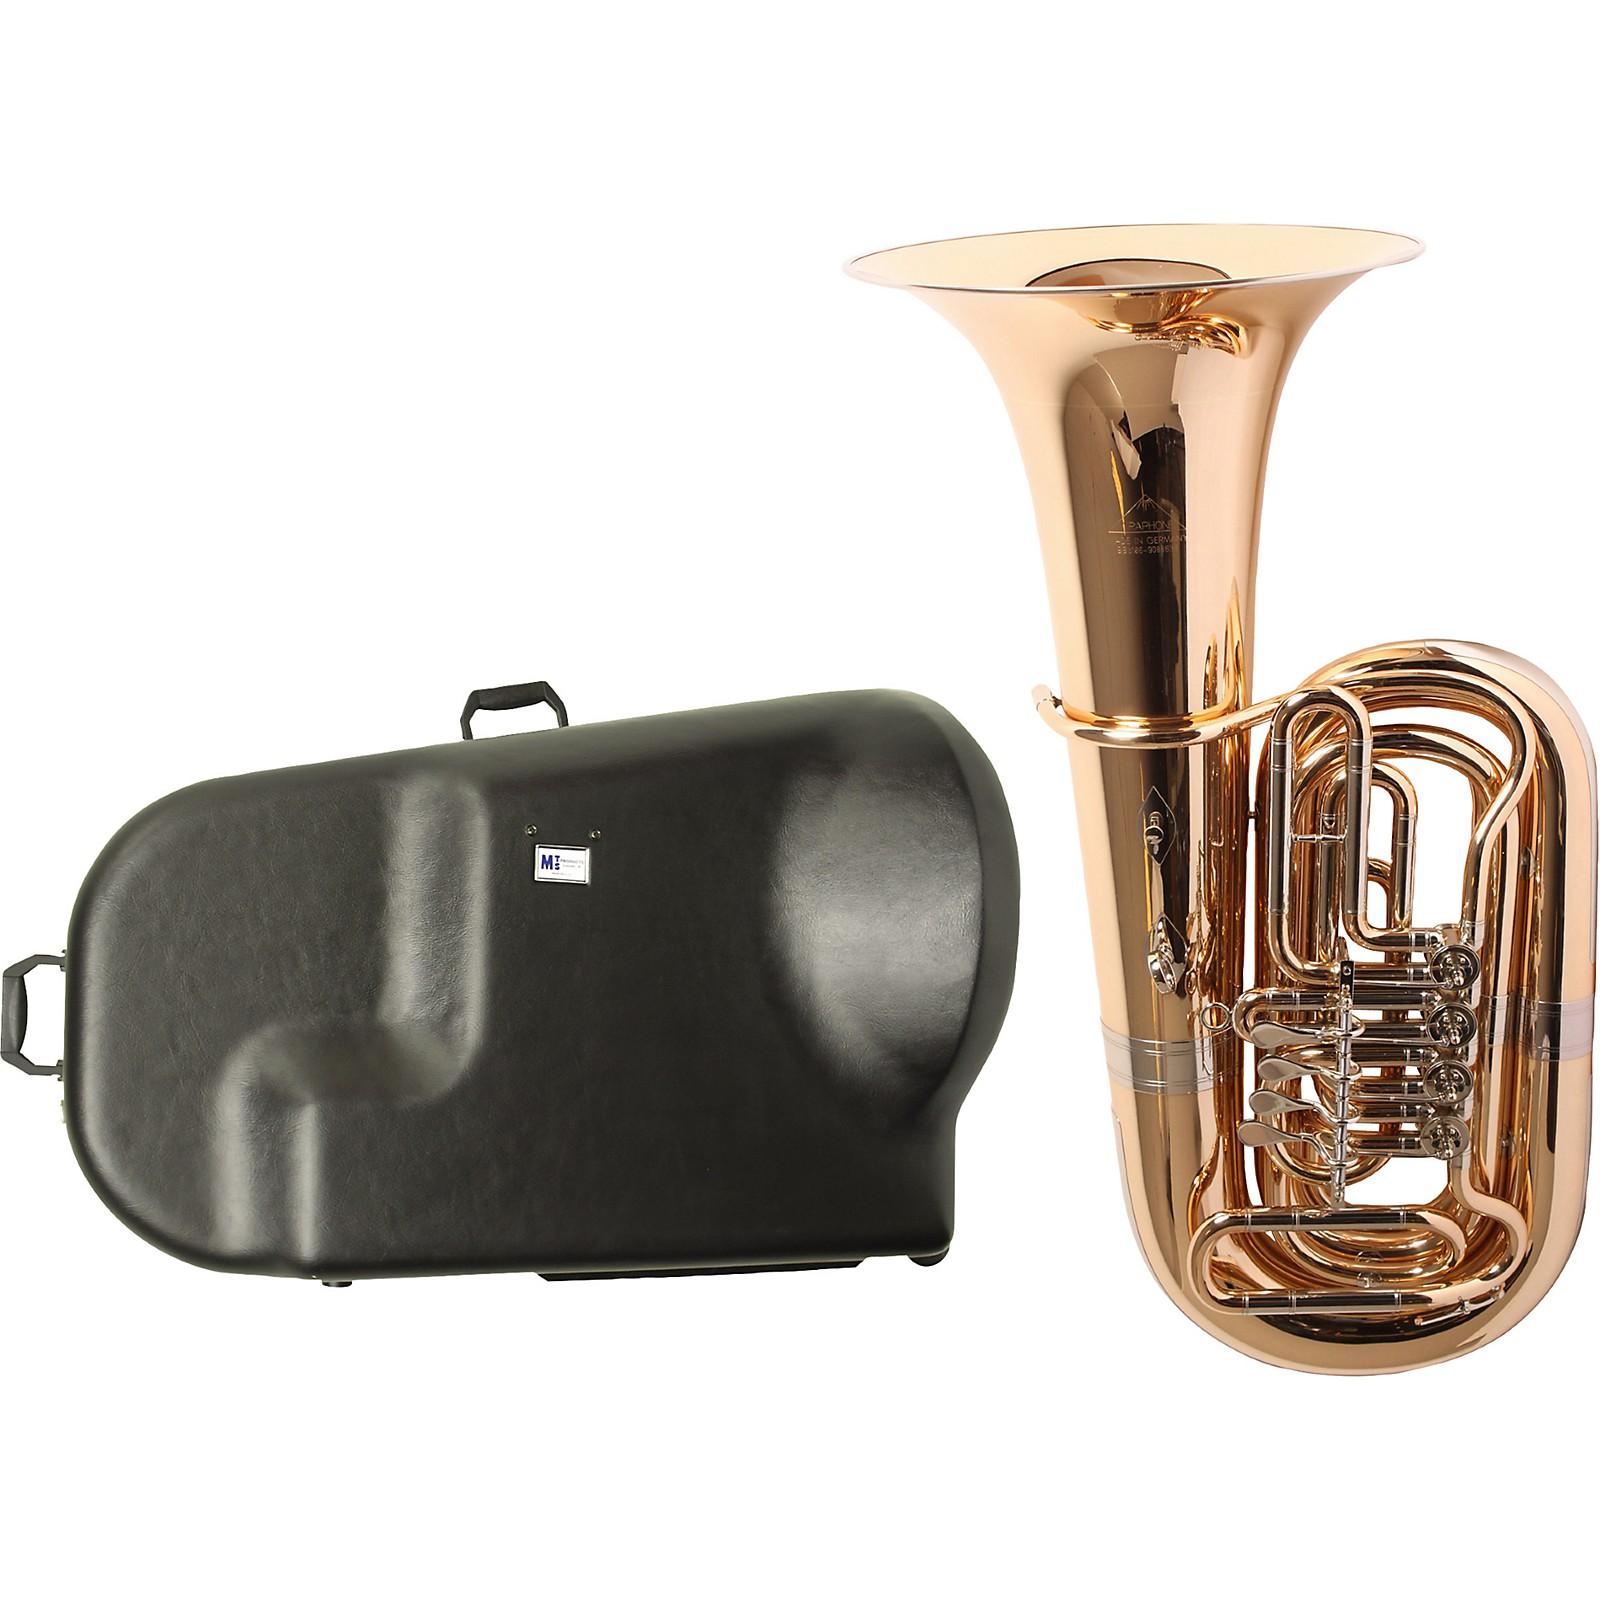 Miraphone 186-4U Series 4-Valve Gold Brass BBb Tuba with Hard Case